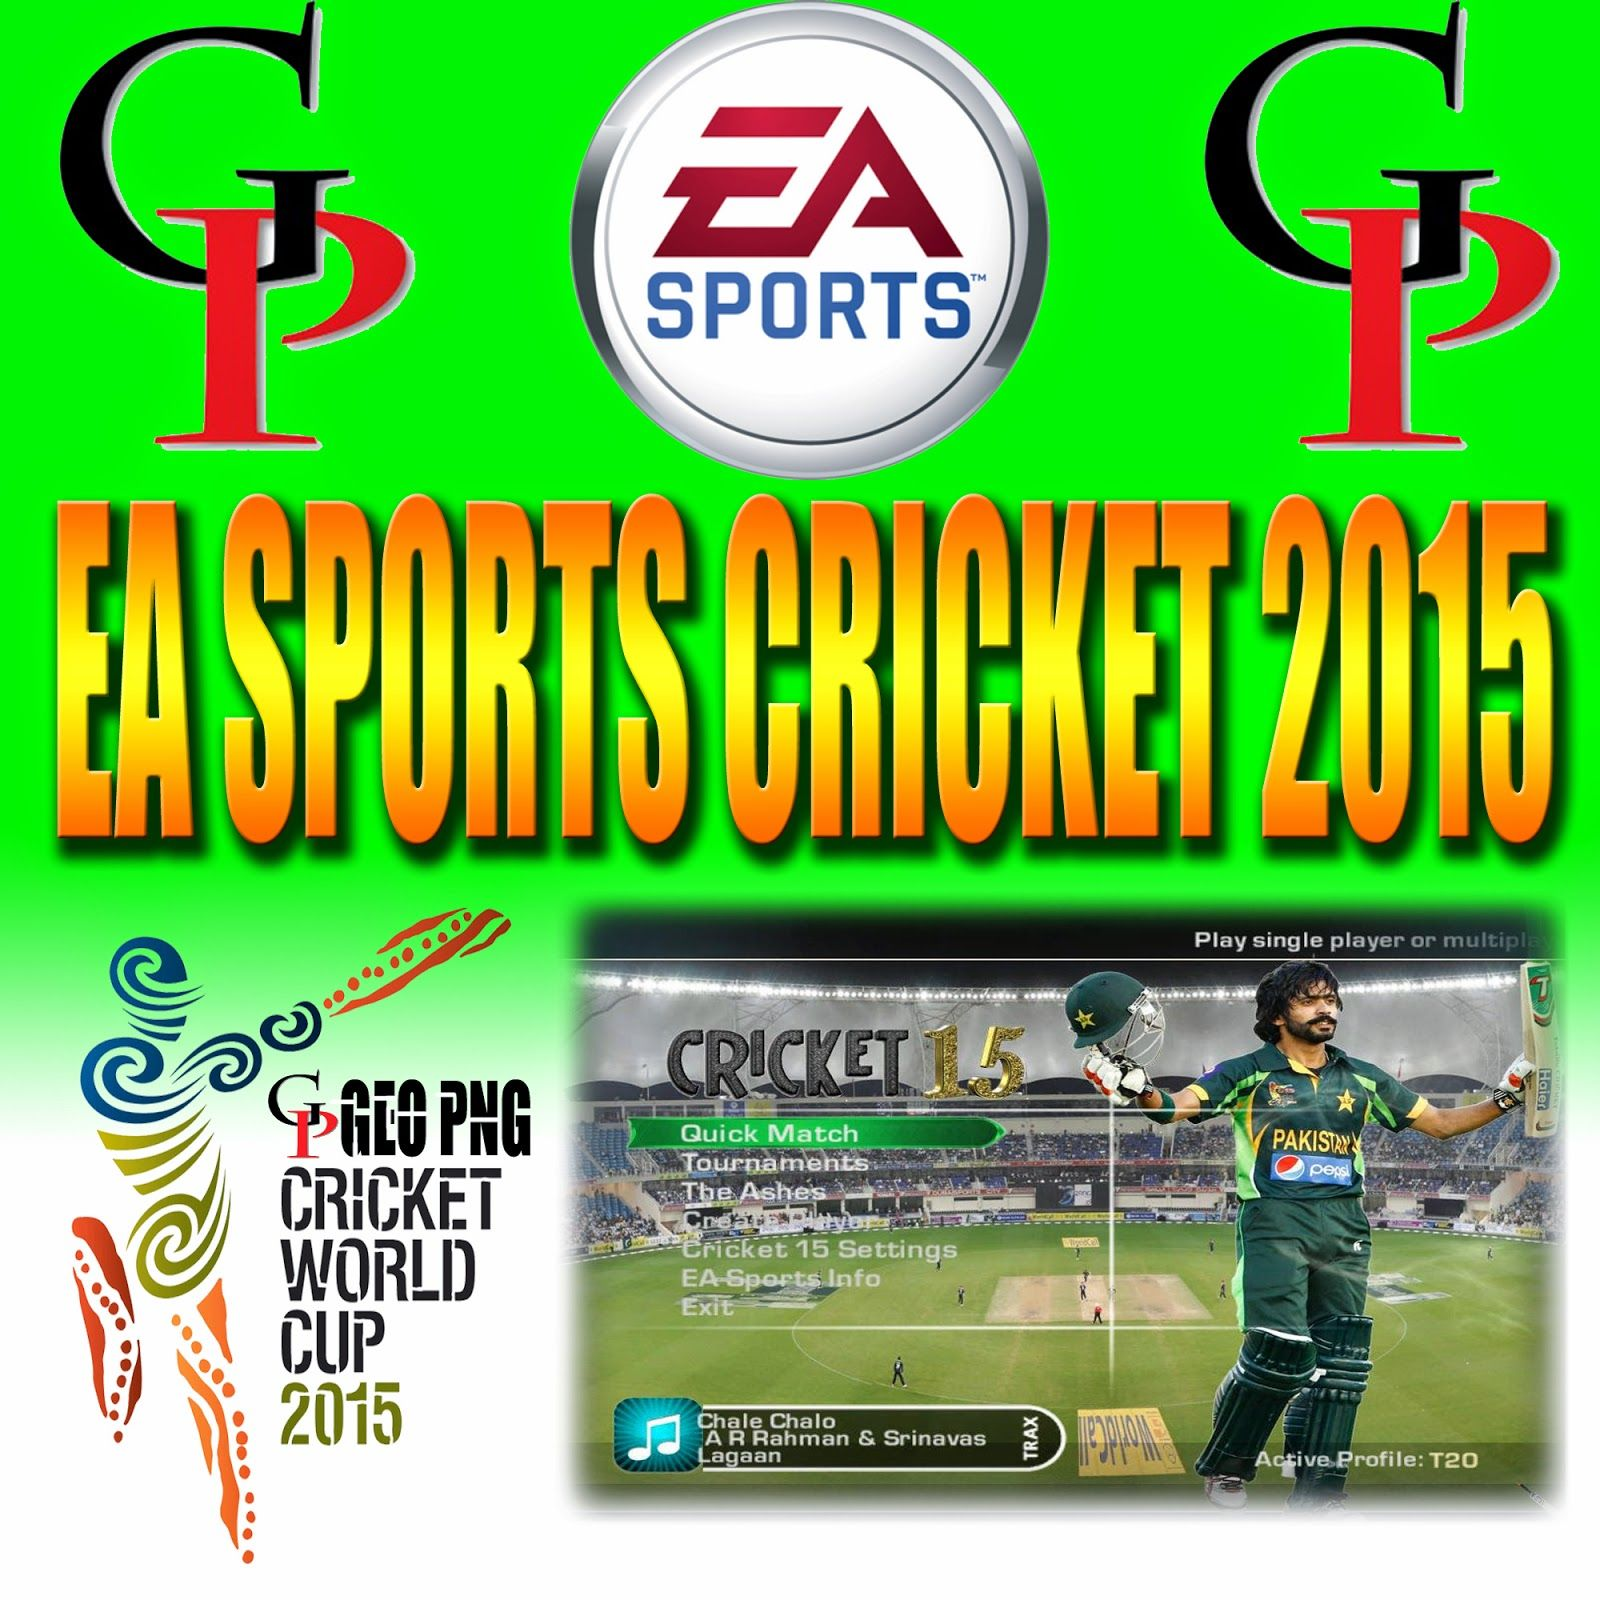 ea sports cricket 2015 free download utorrent link